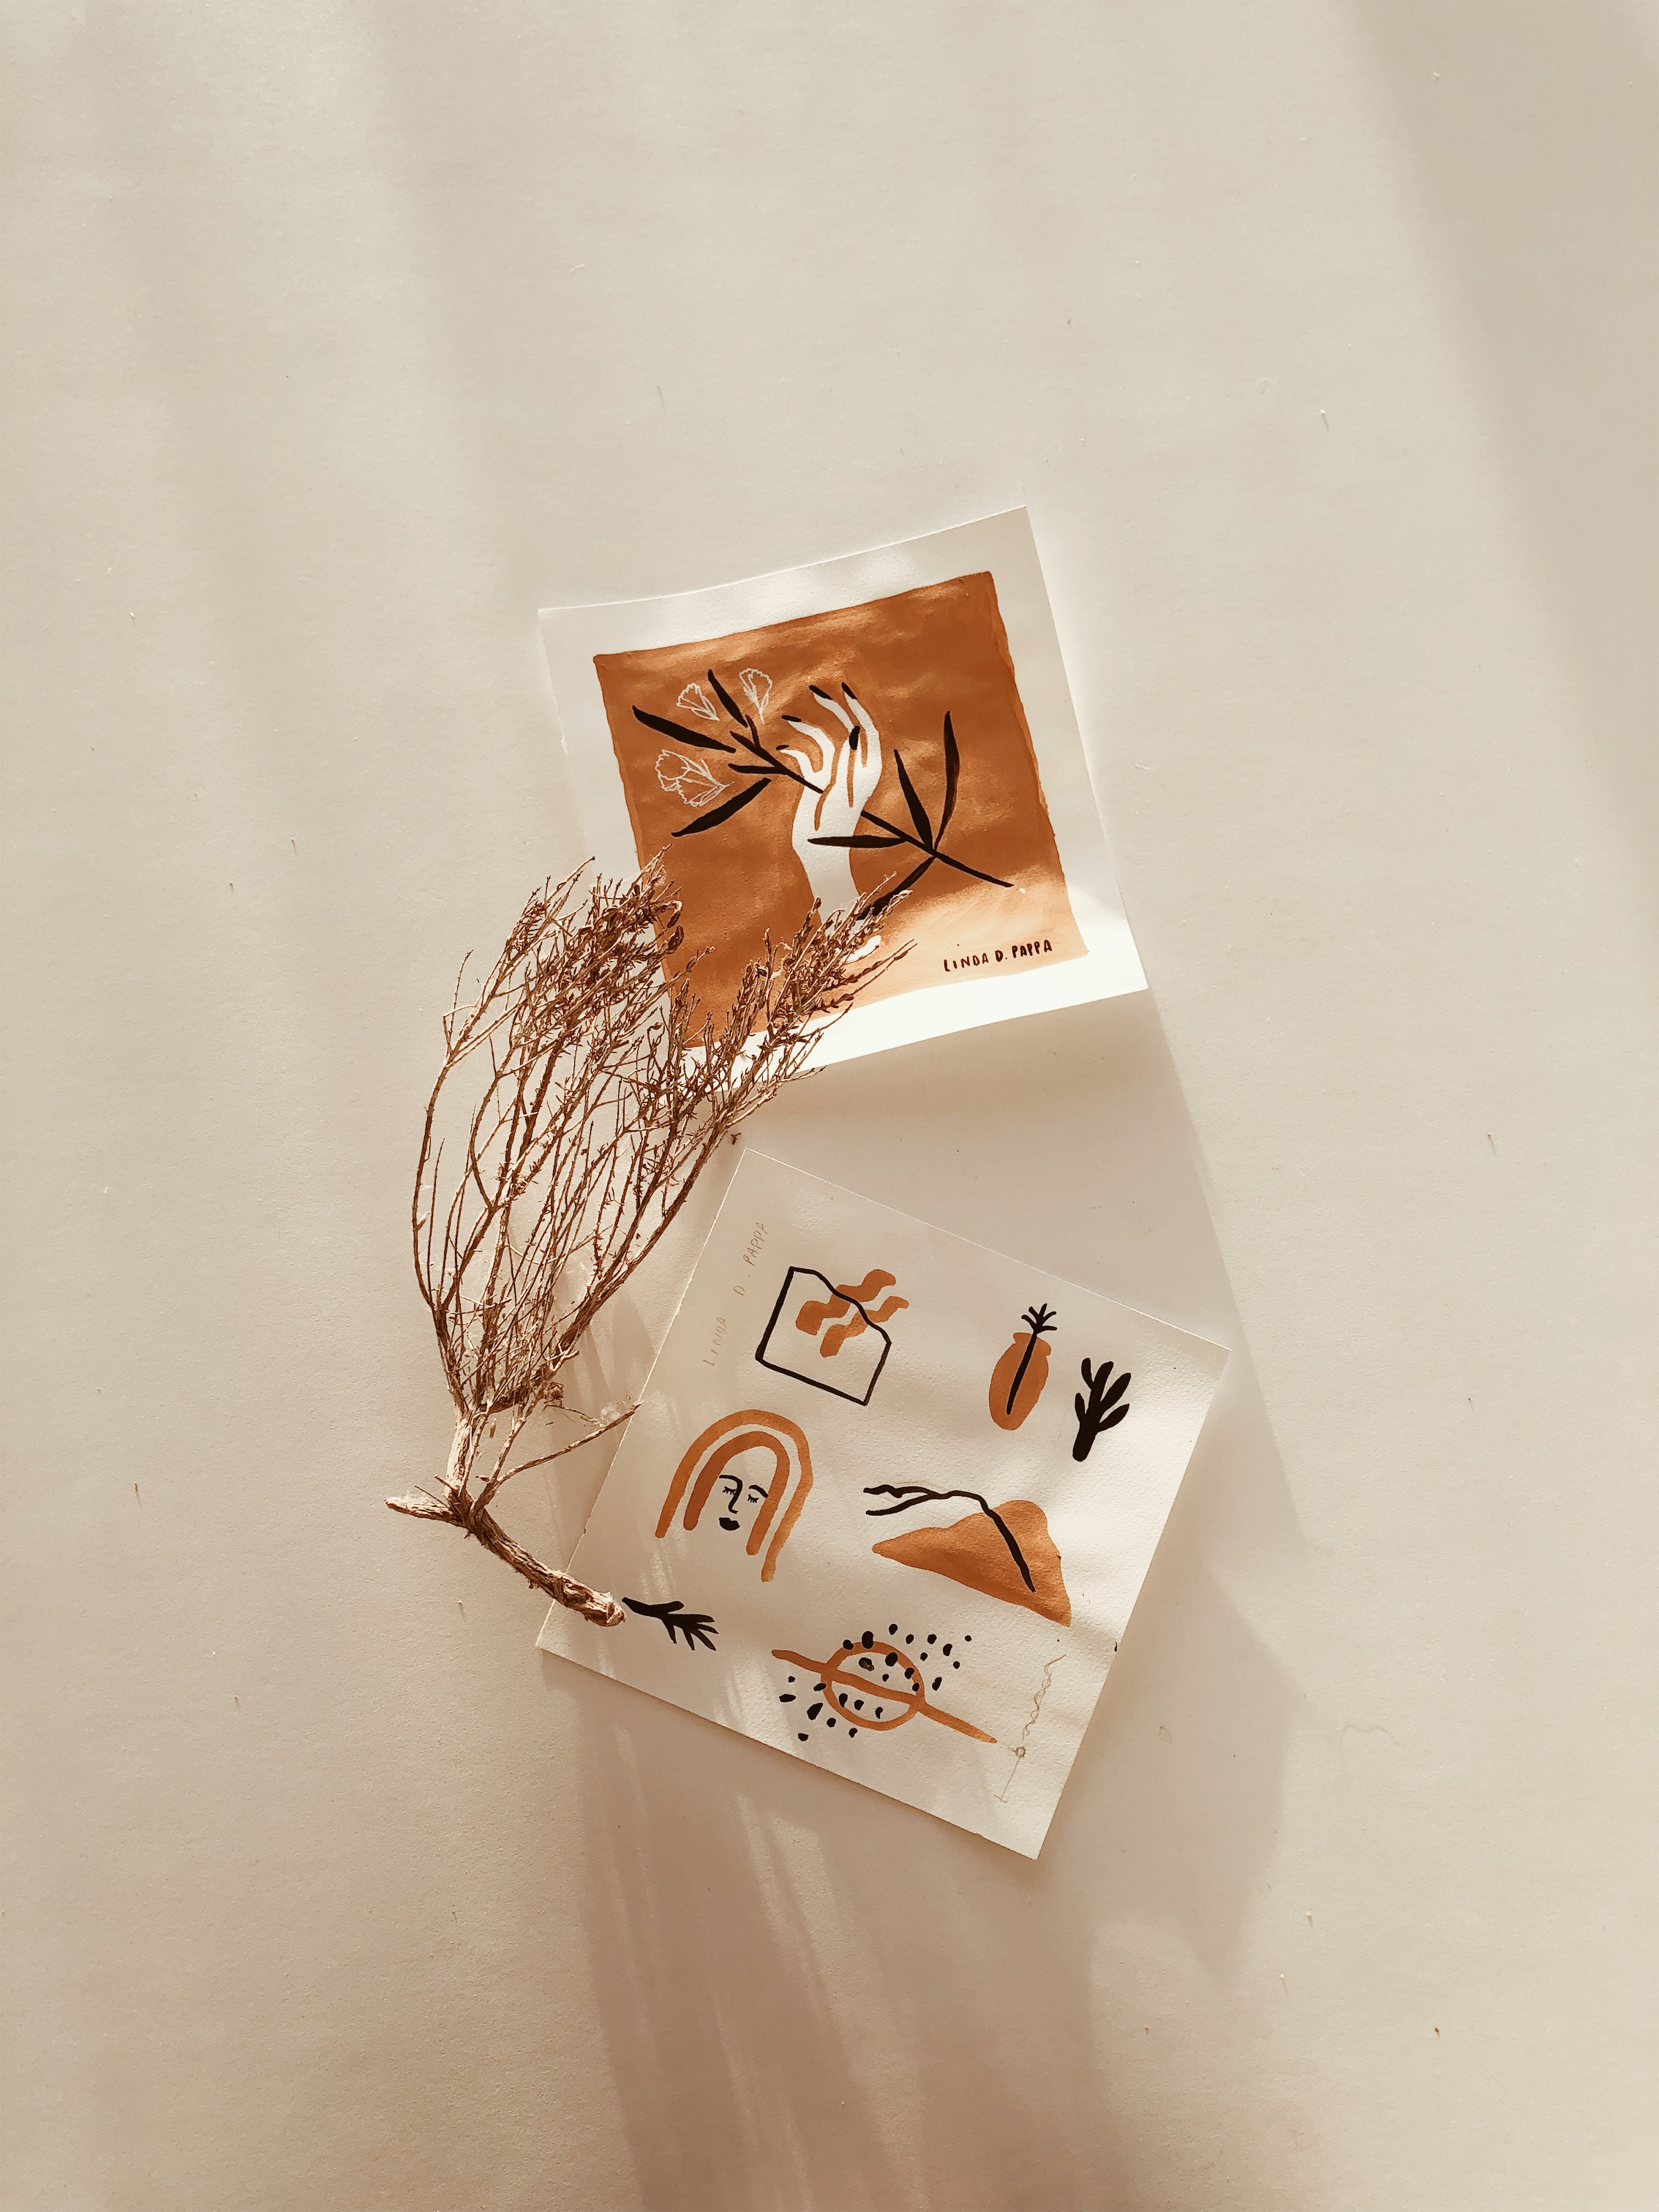 Linda-Pappa-Apricot-Series-02.jpeg